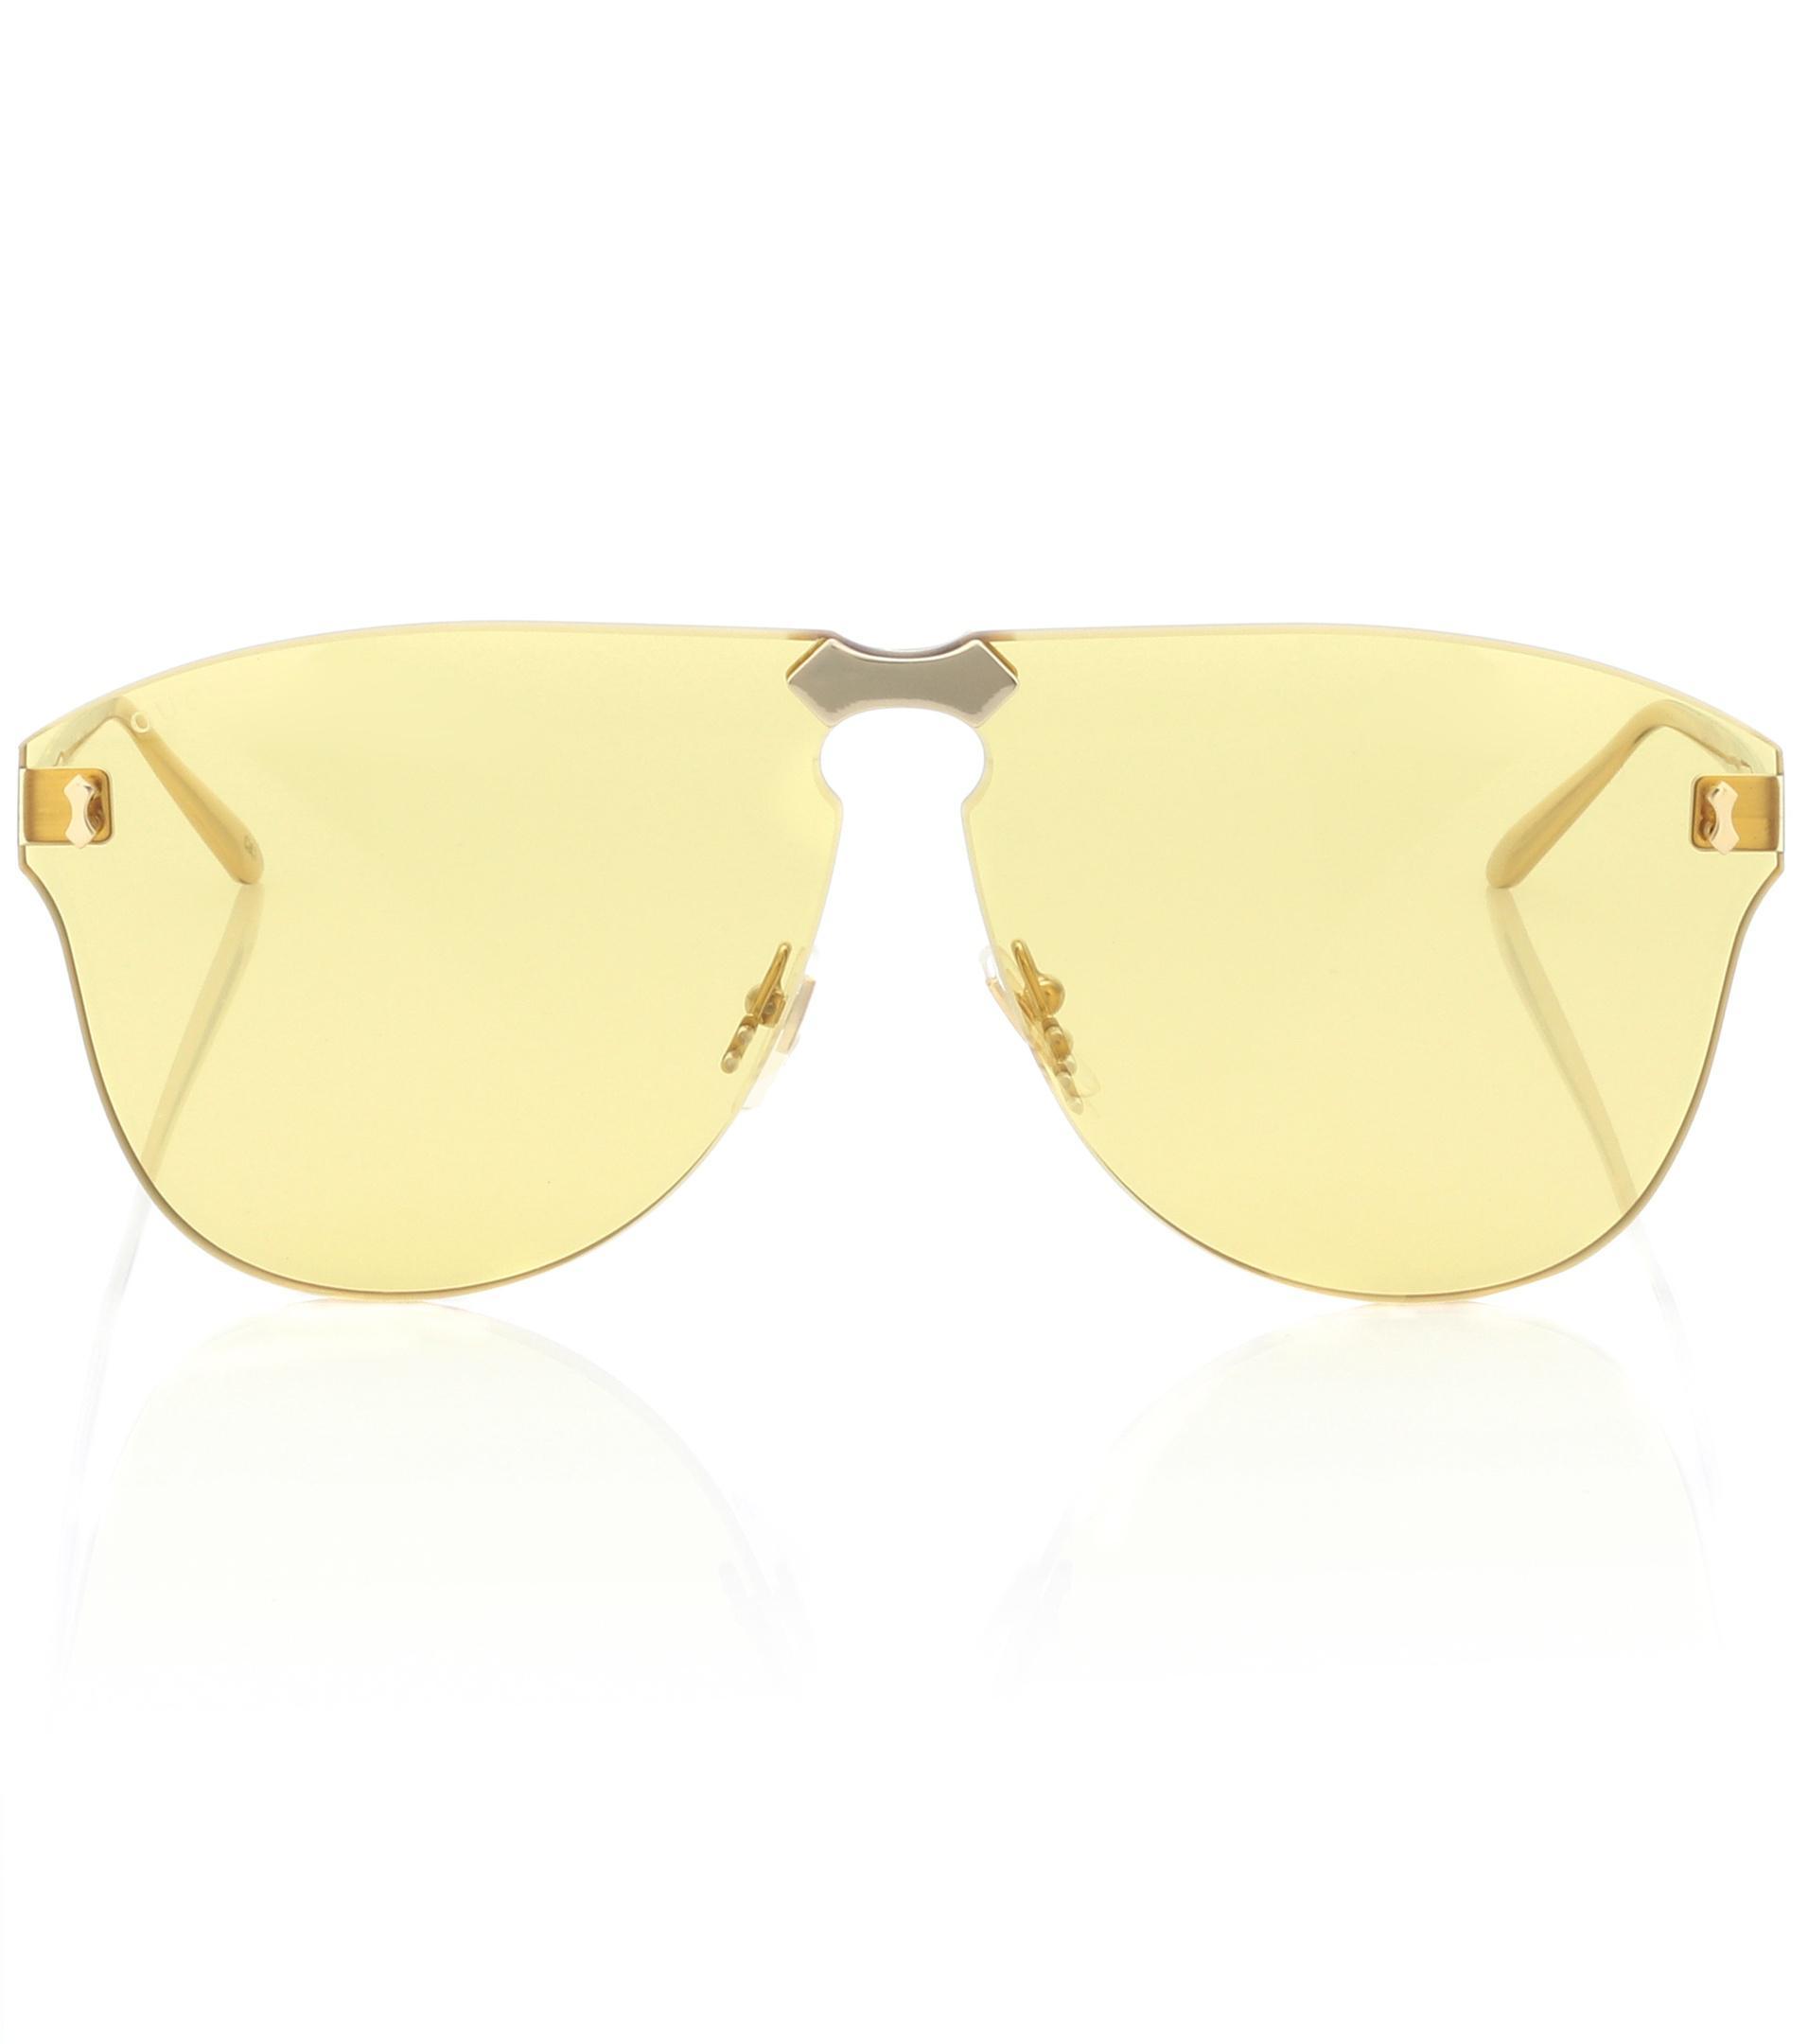 e80a08a7bd Gucci Oversized Flip Up Sunglasses ✓ Sunglasses Galleries